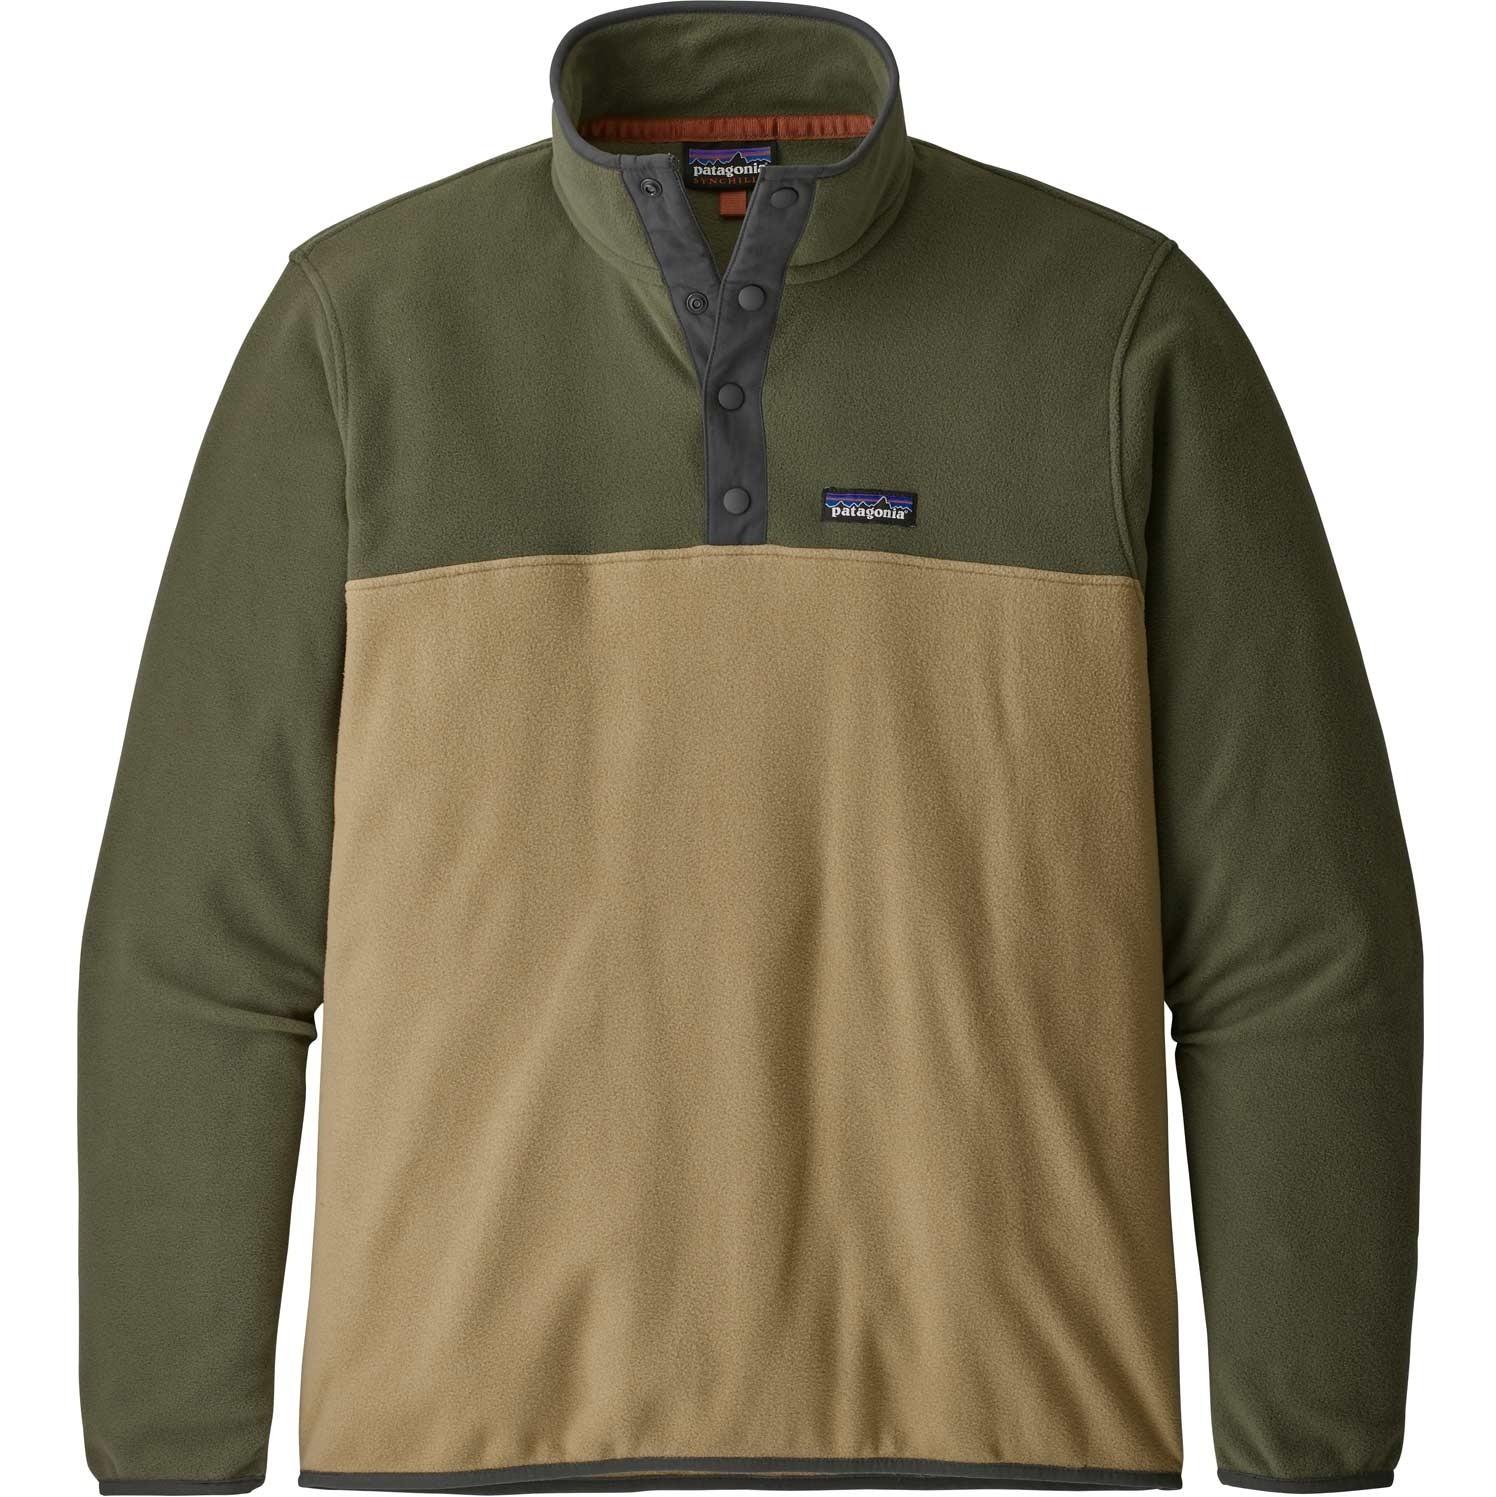 Patagonia Micro D Snap-T Pullover - Men's - Classic Tan